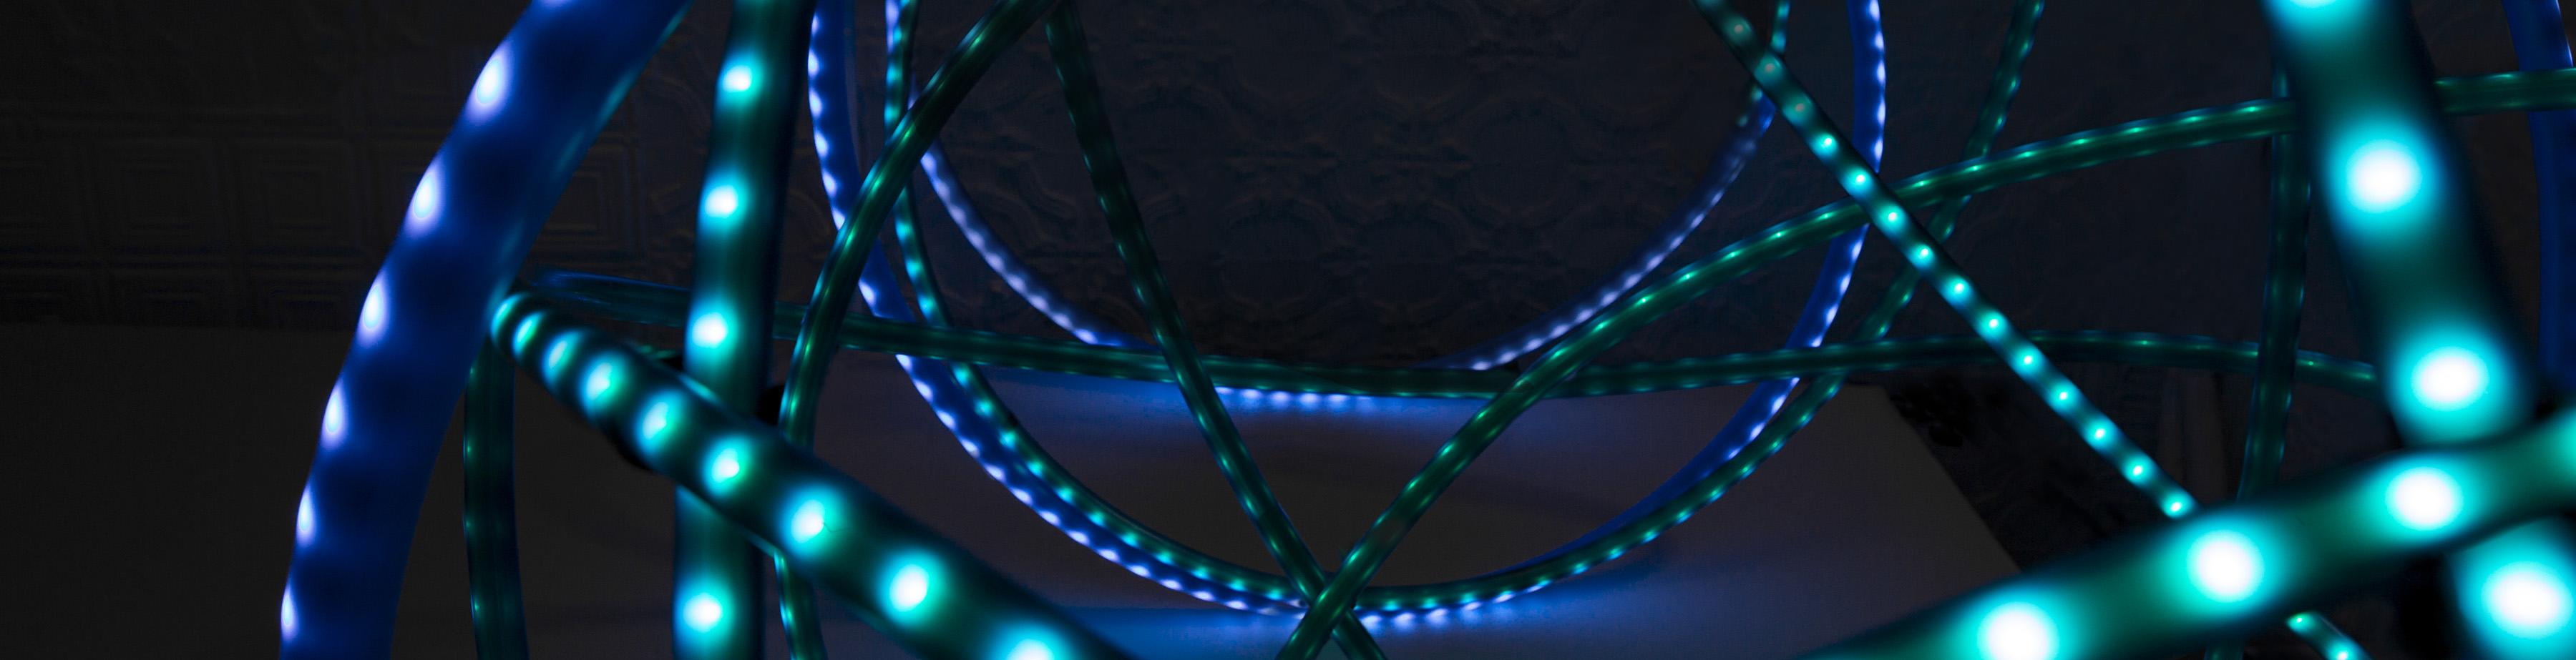 grimanesa Amoros azulin 2 light sculpture